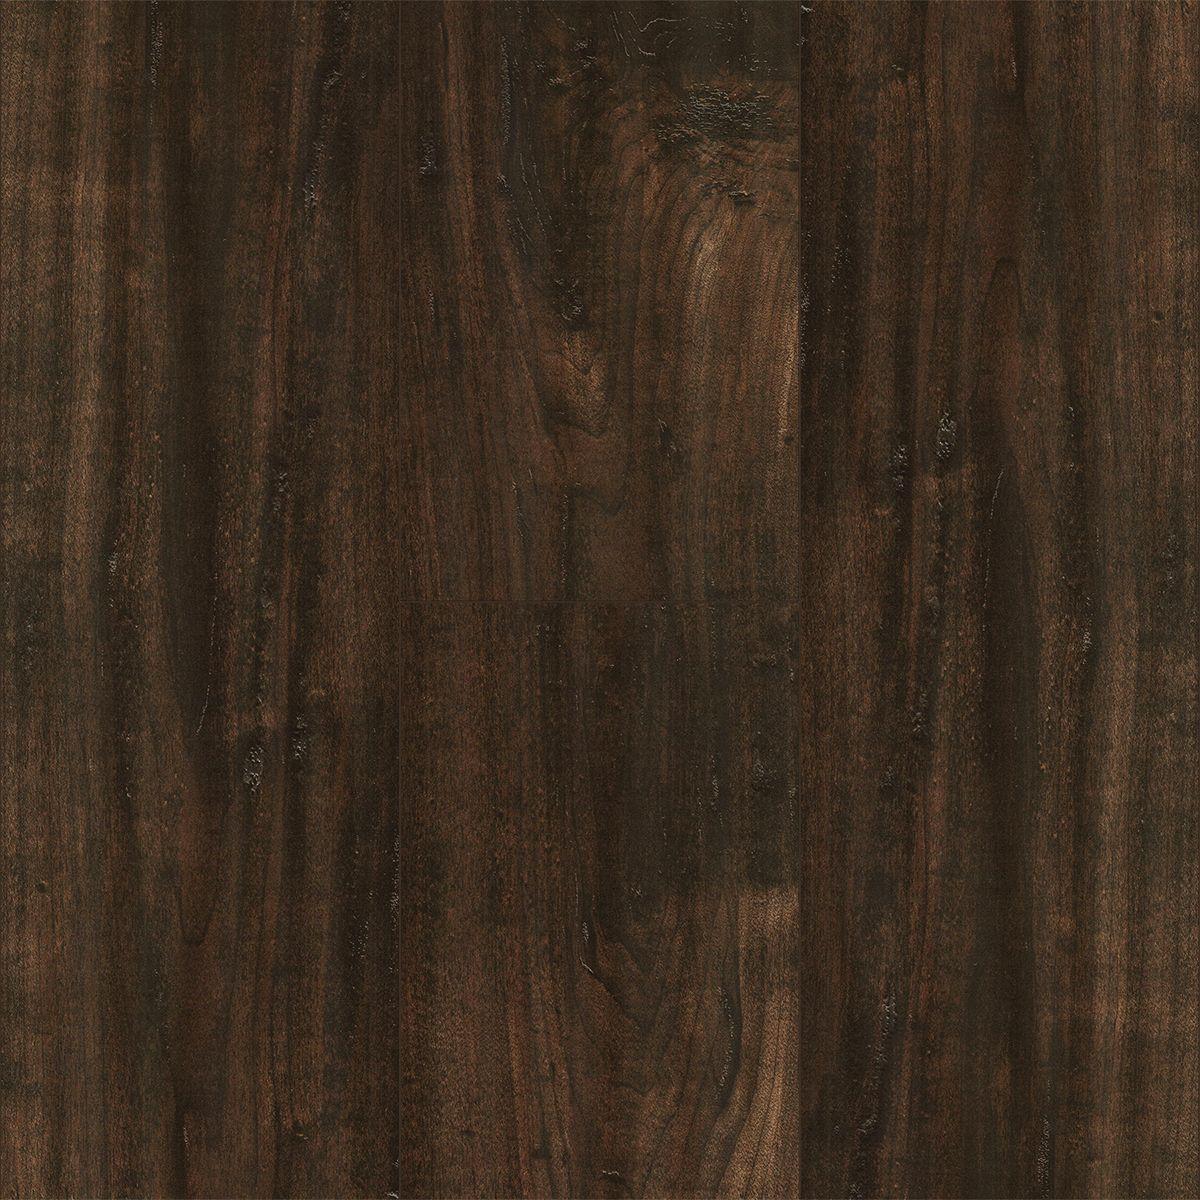 Feather step serengeti plank hand scraped laminate Are laminate wood floors durable